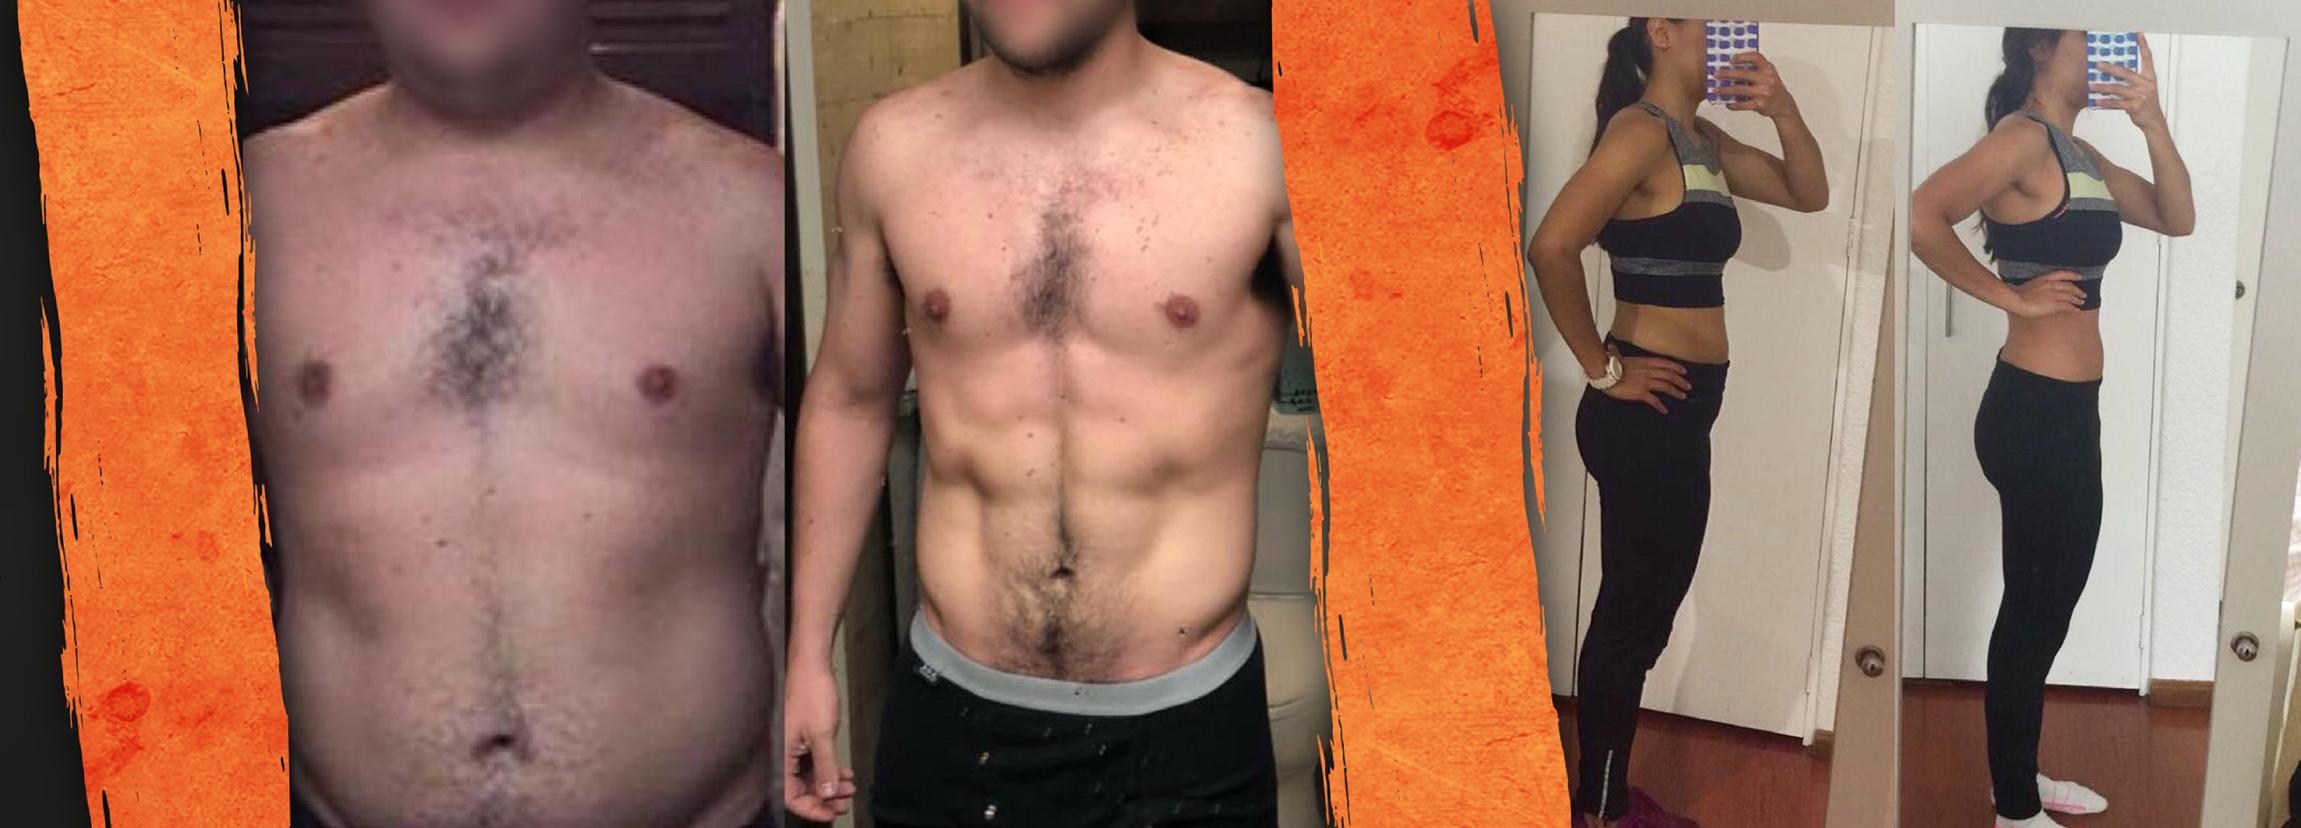 Fullbody workouts